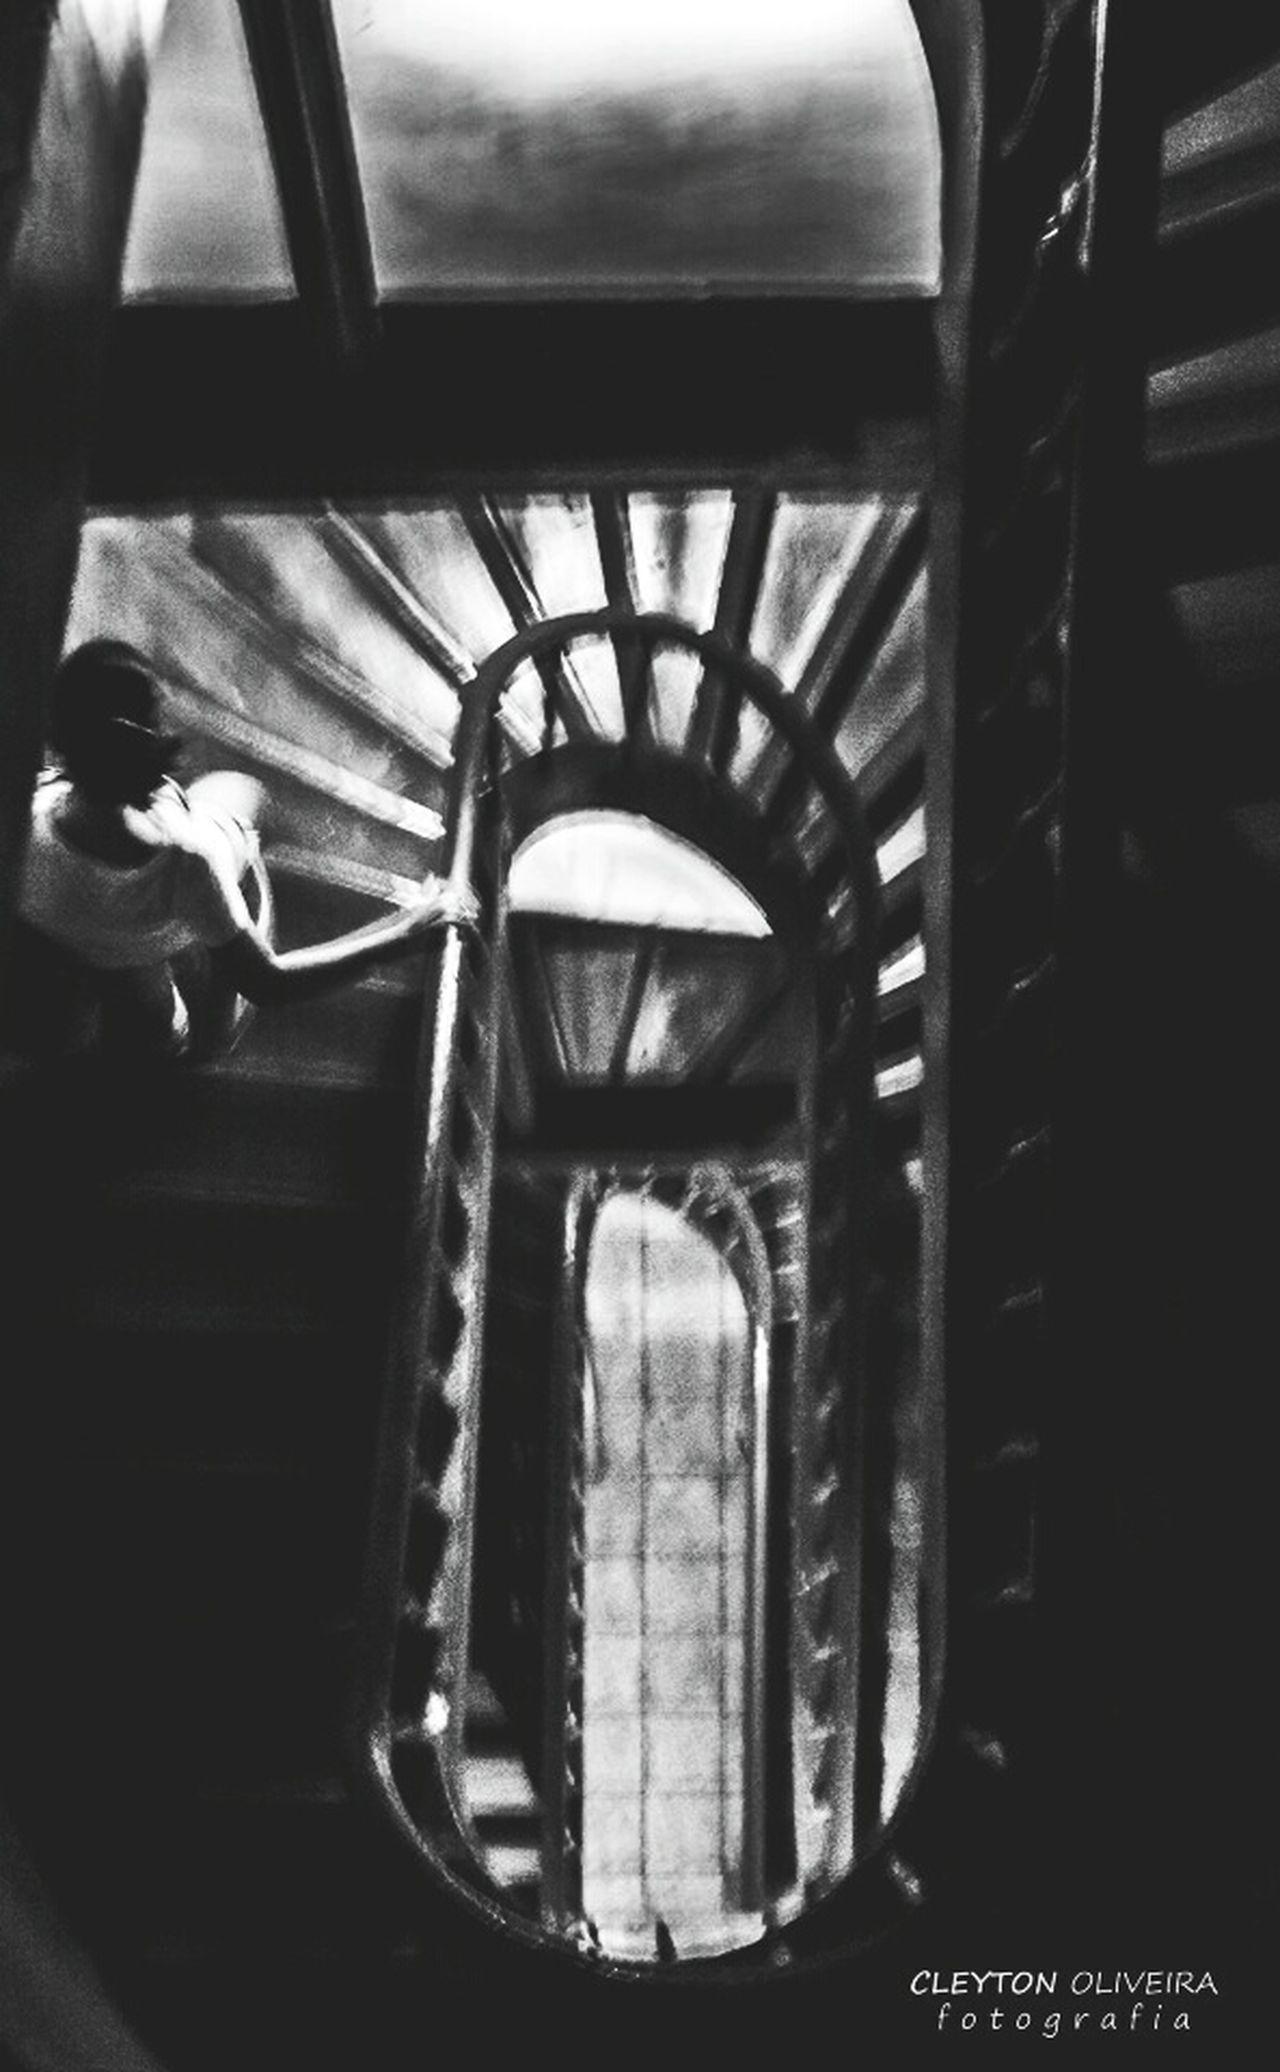 Fotografia De Rua Blackandwhite Photography Urbanphotography Preto & Branco Black And White Photography Streetphoto_bw Pretoebranco Black&white Black & White Blackandwhite Streetphotography RecifeAntigo Recife, BRASIL